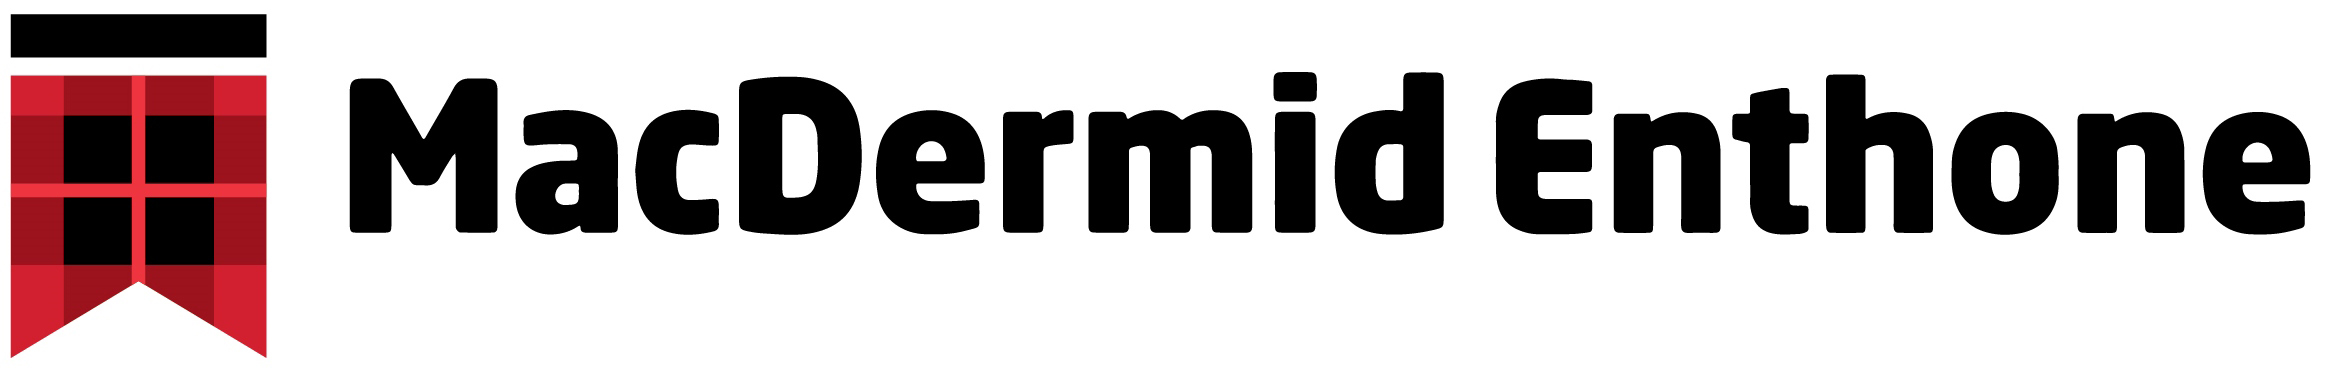 MacDermid Enthone